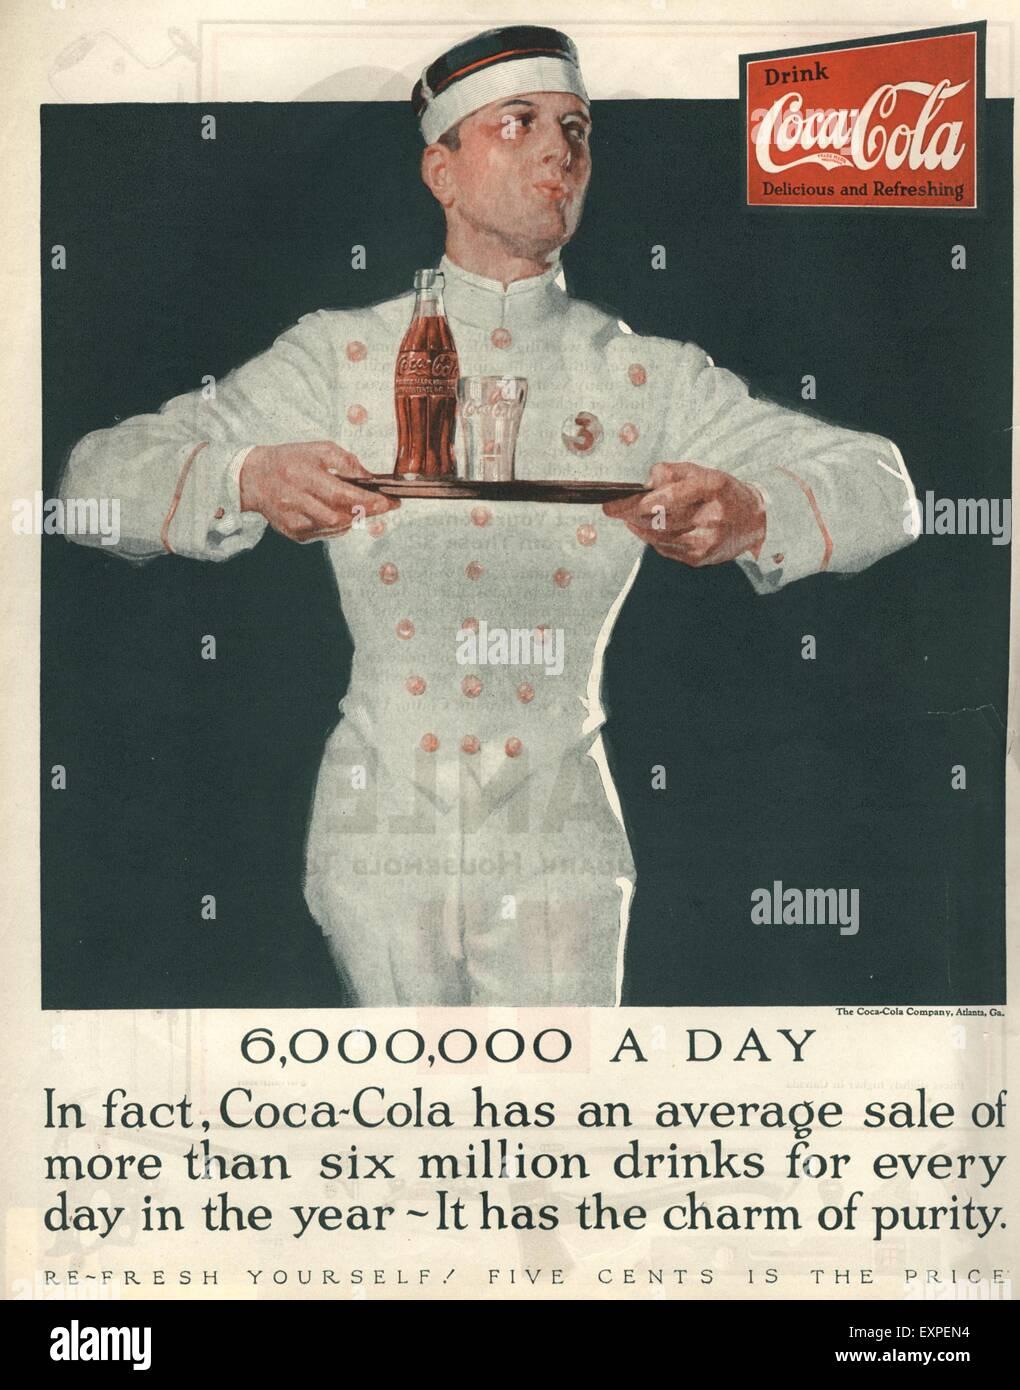 Usa Magazine Advert 1920s Stock Photos Usa Magazine Advert 1920s